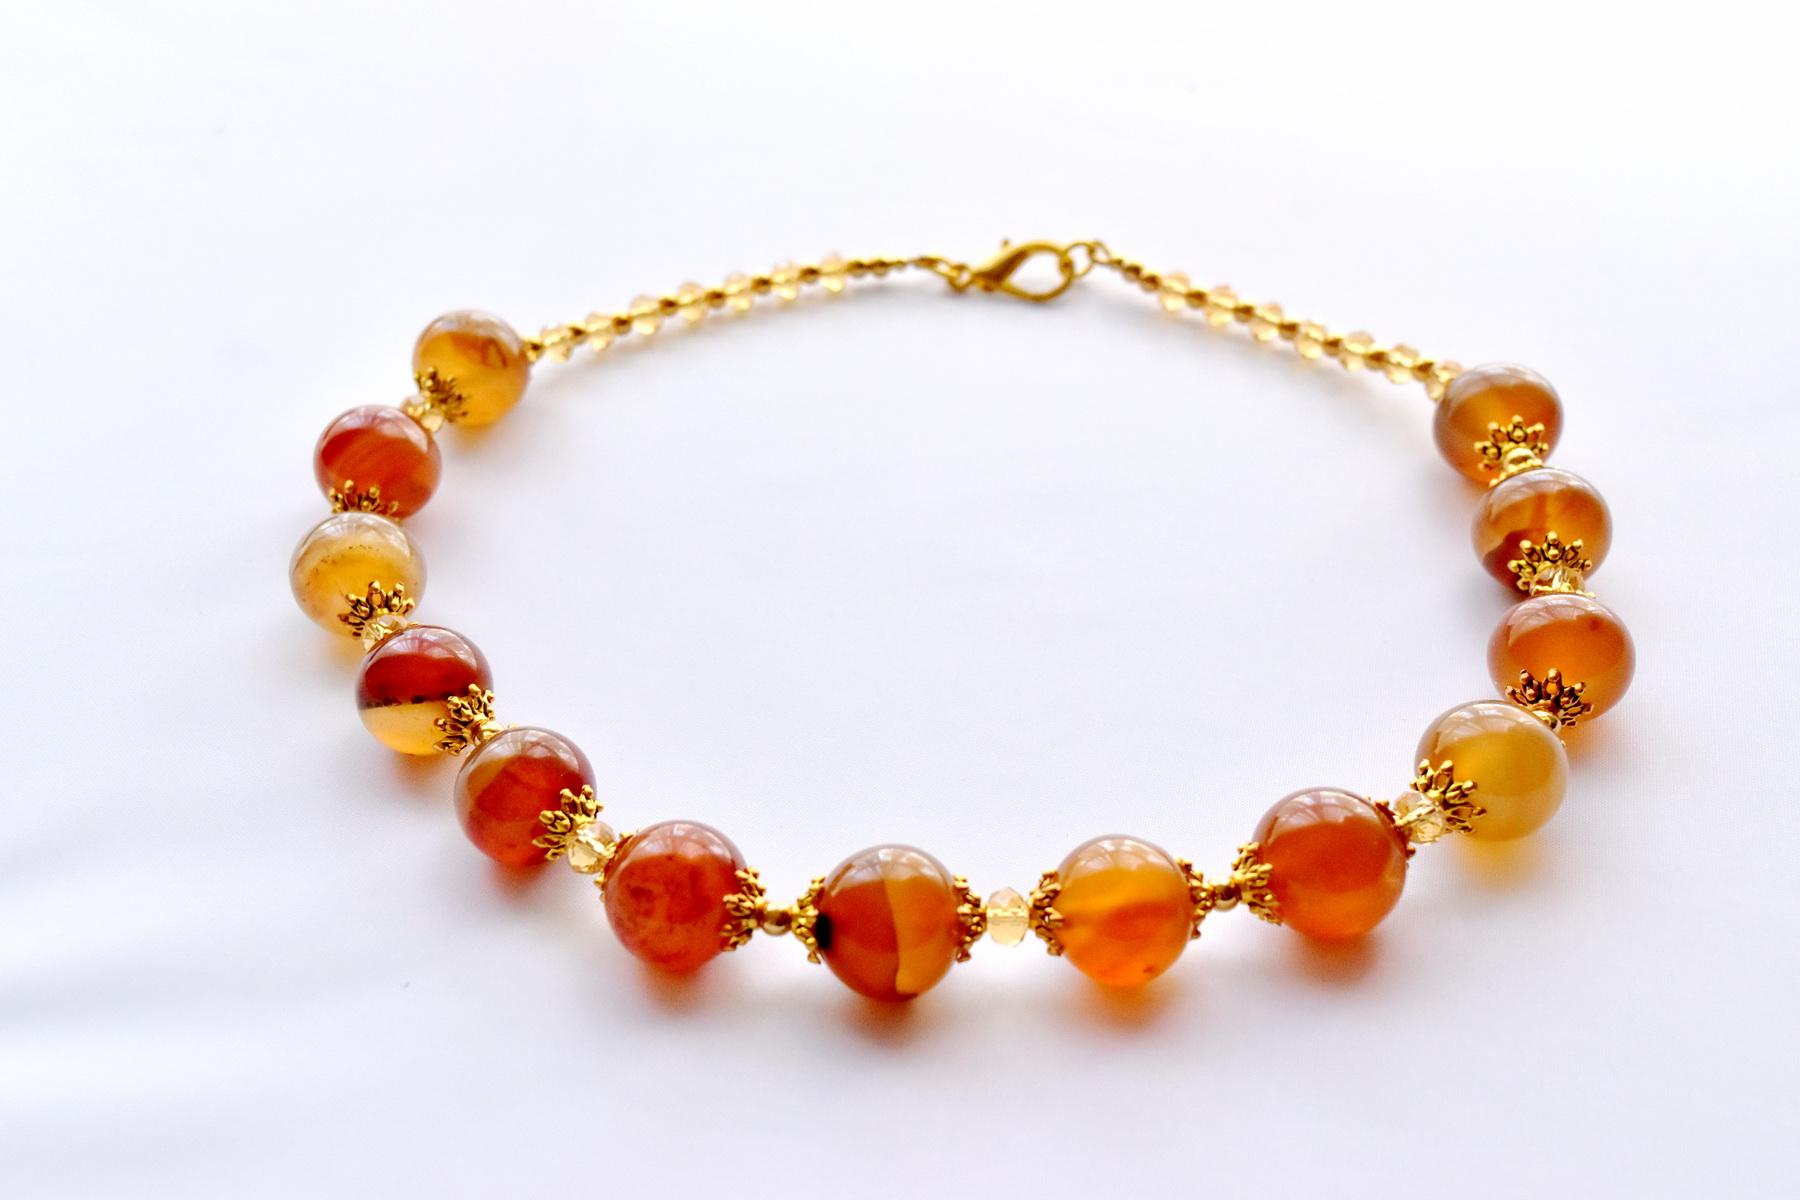 Orange Agate Necklace with Topaz – Beaded Handmade Jewellery